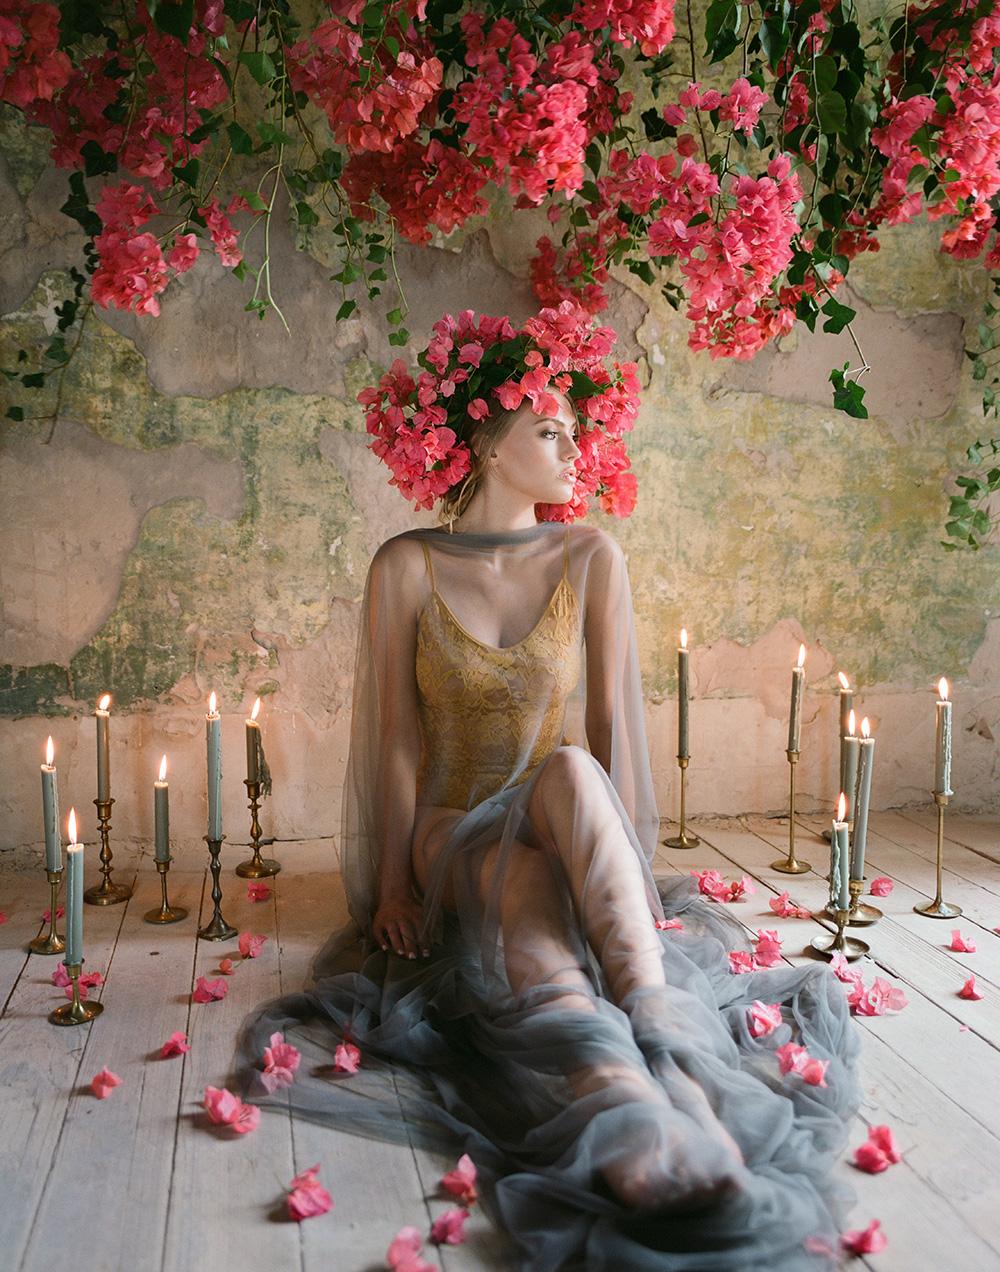 Sara Donaldson_Celedon Style_Artfully Framed WEB_0001.jpg